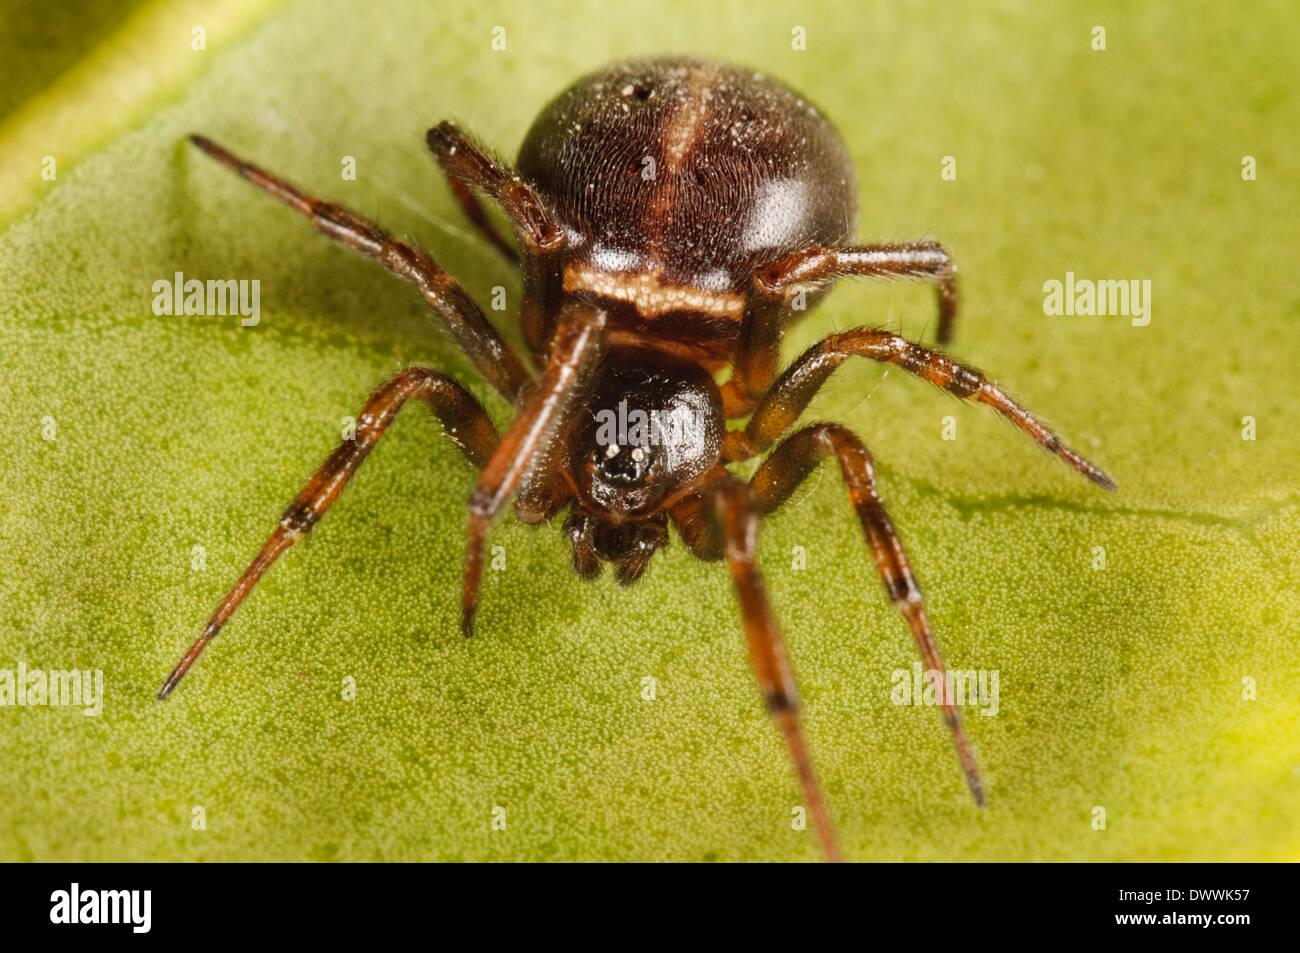 Common false widow, aka rabbit hutch spider (Steatoda bipunctata), adult female sitting on a green leaf in Thirsk - Stock Image